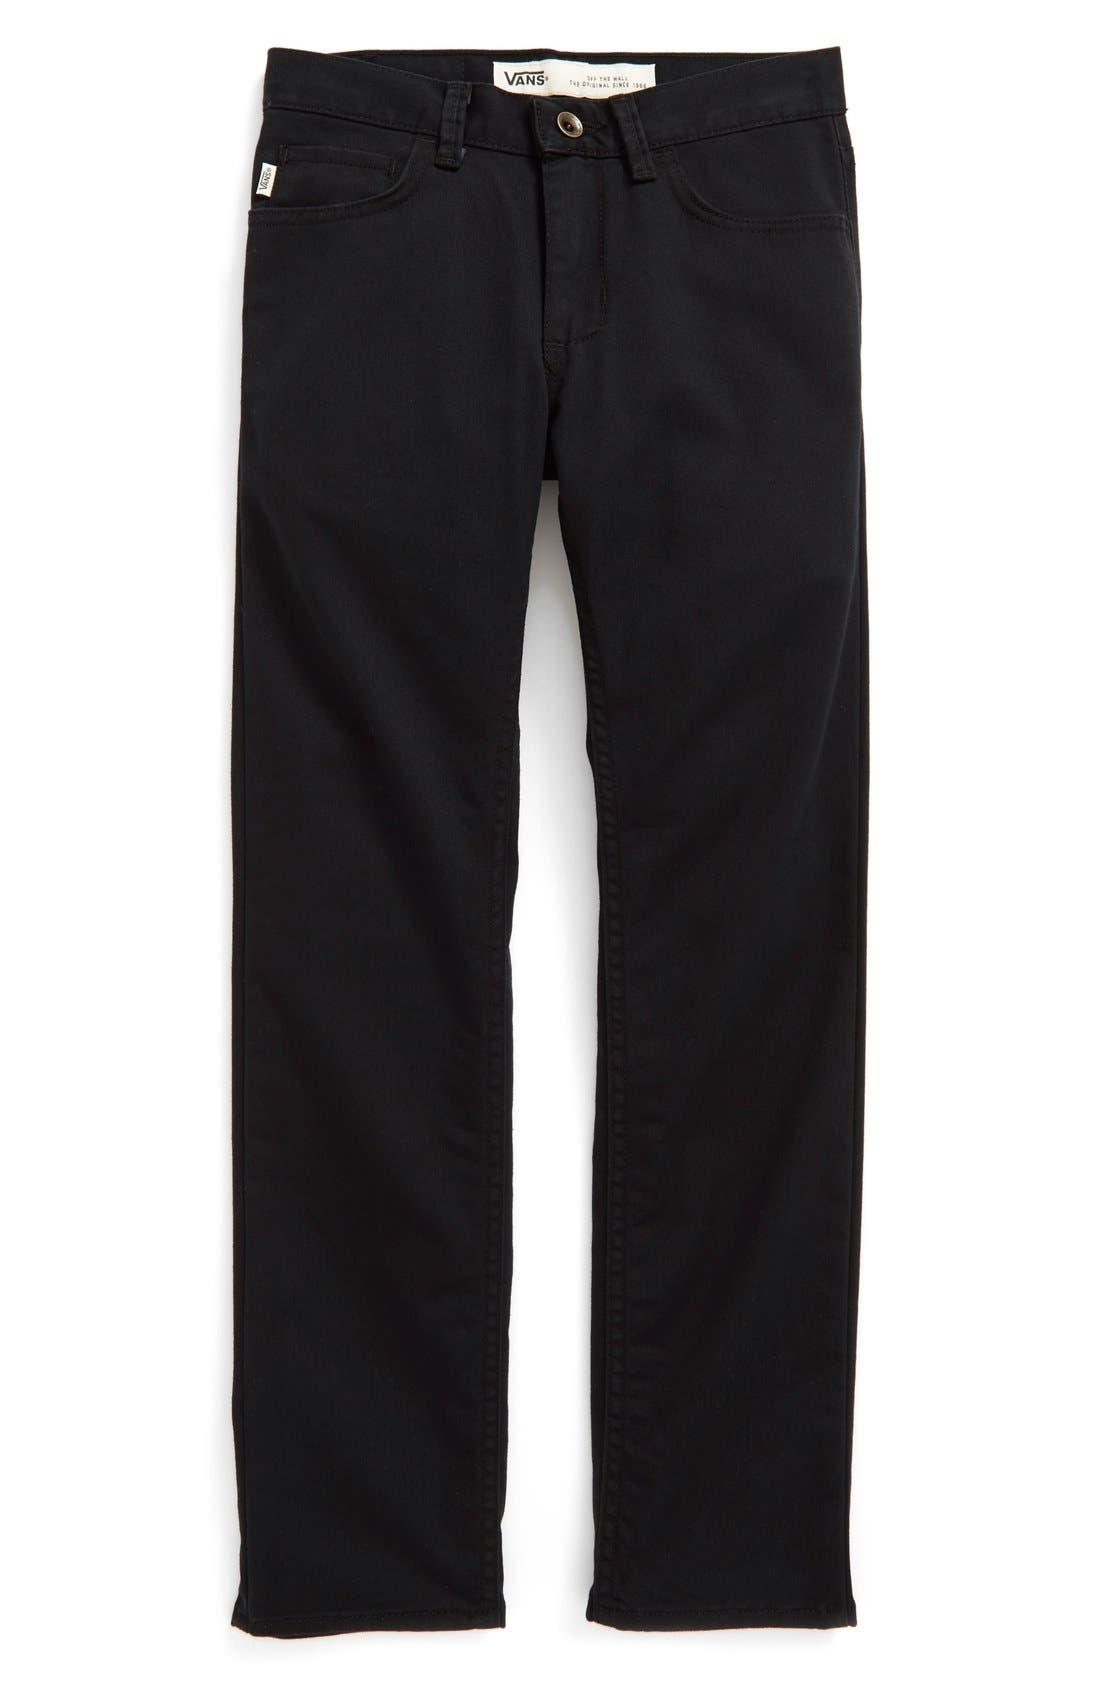 'V56 Standard AV Covina' Pants,                             Main thumbnail 1, color,                             Black